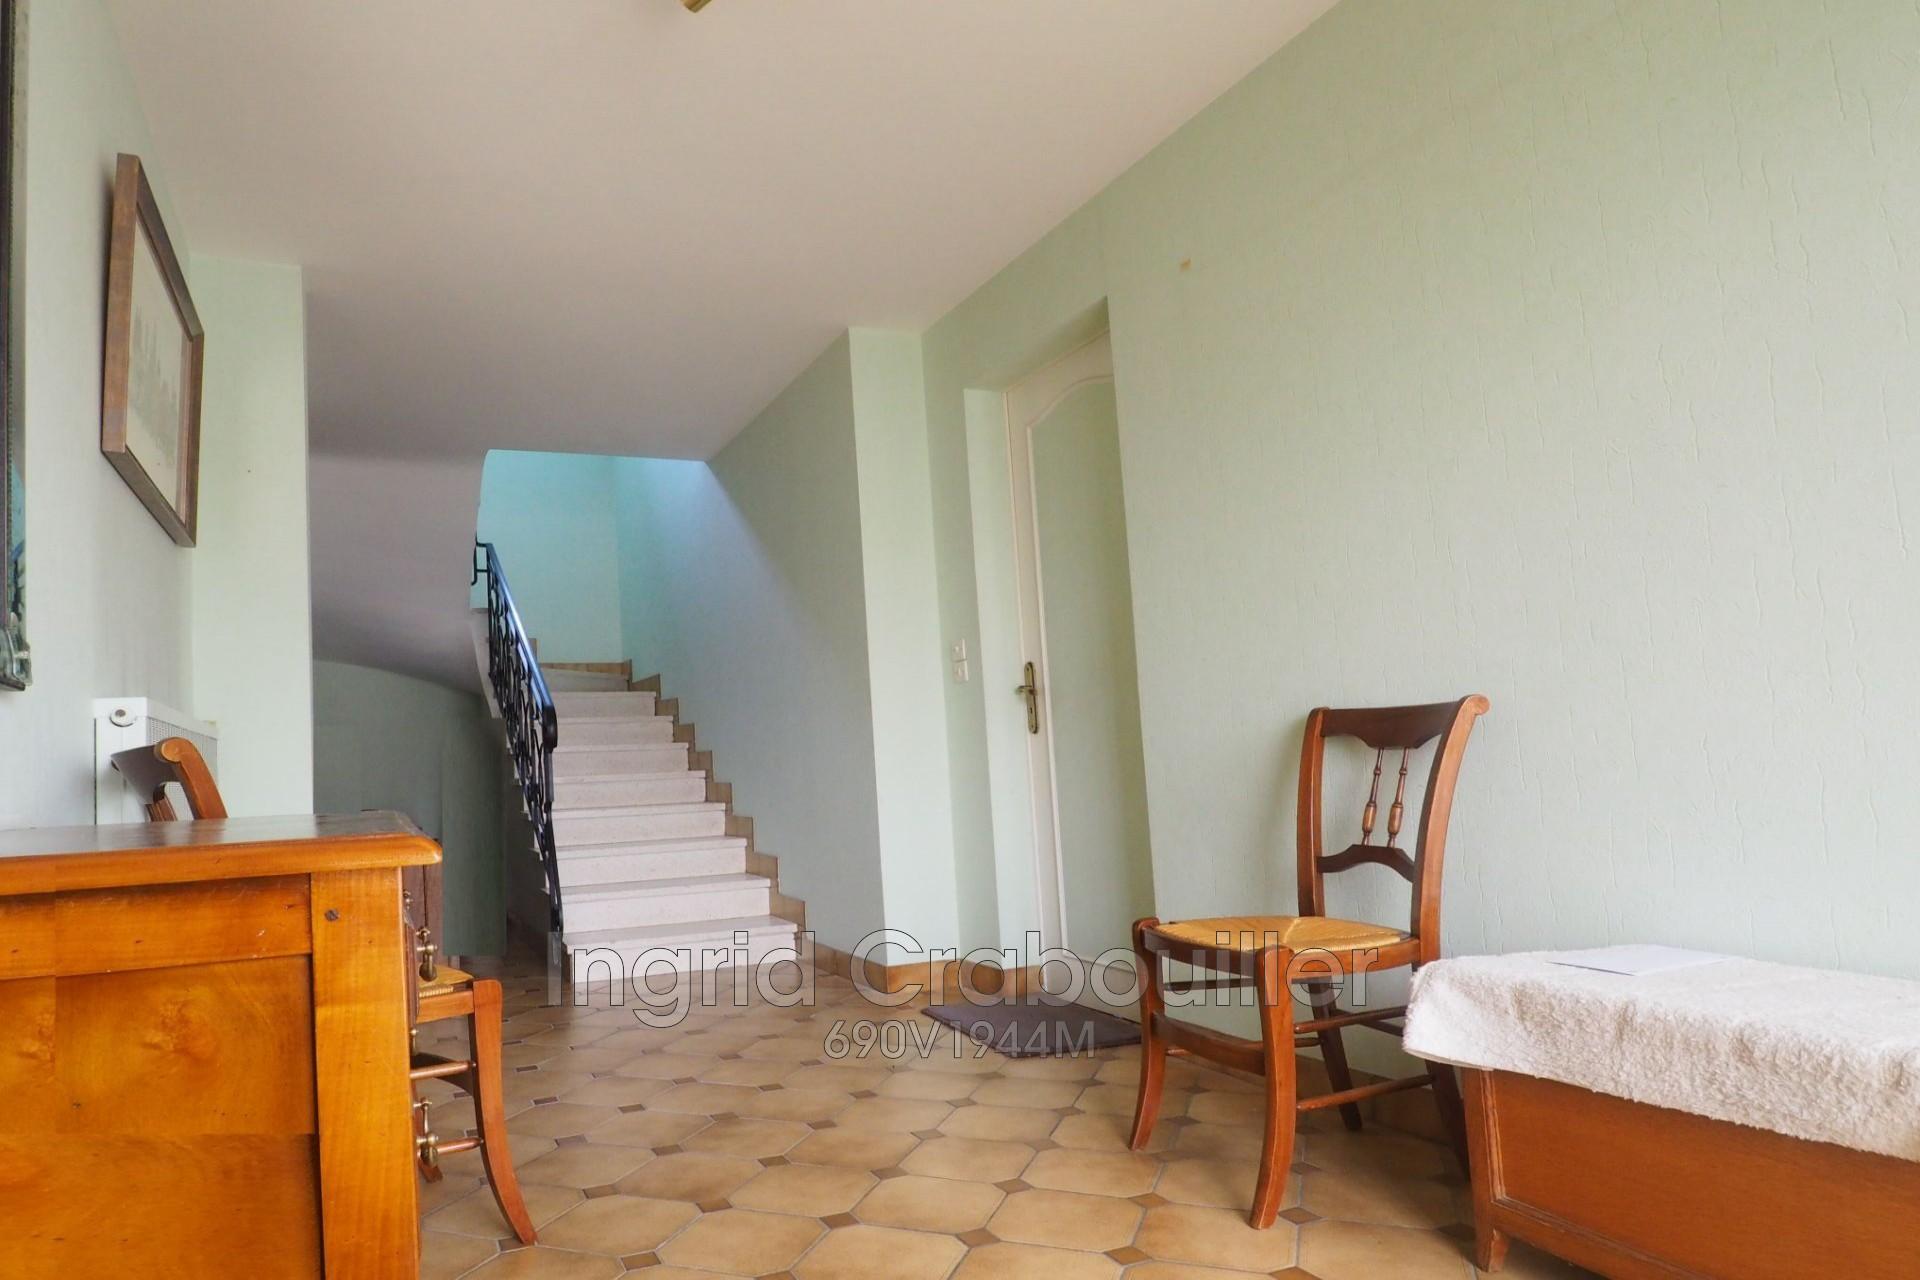 Vente maison Royan - réf. 690V1944M